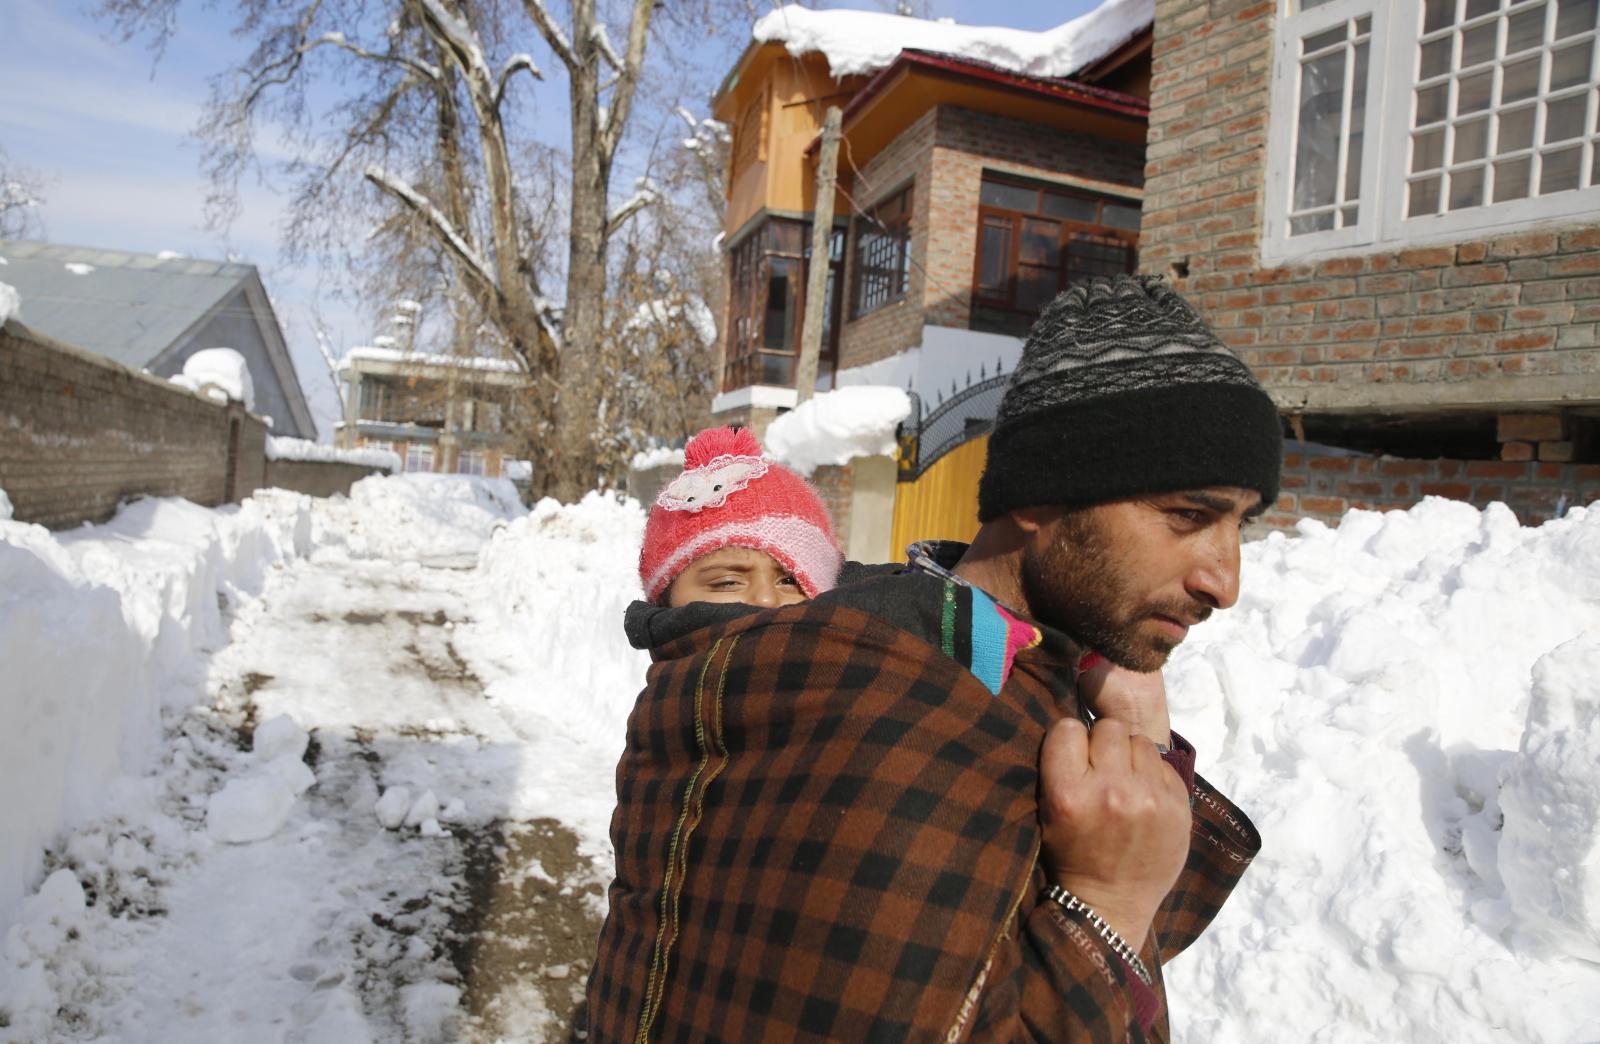 Zaspy śnieżne w Indiach   EPA/FAROOQ KHAN